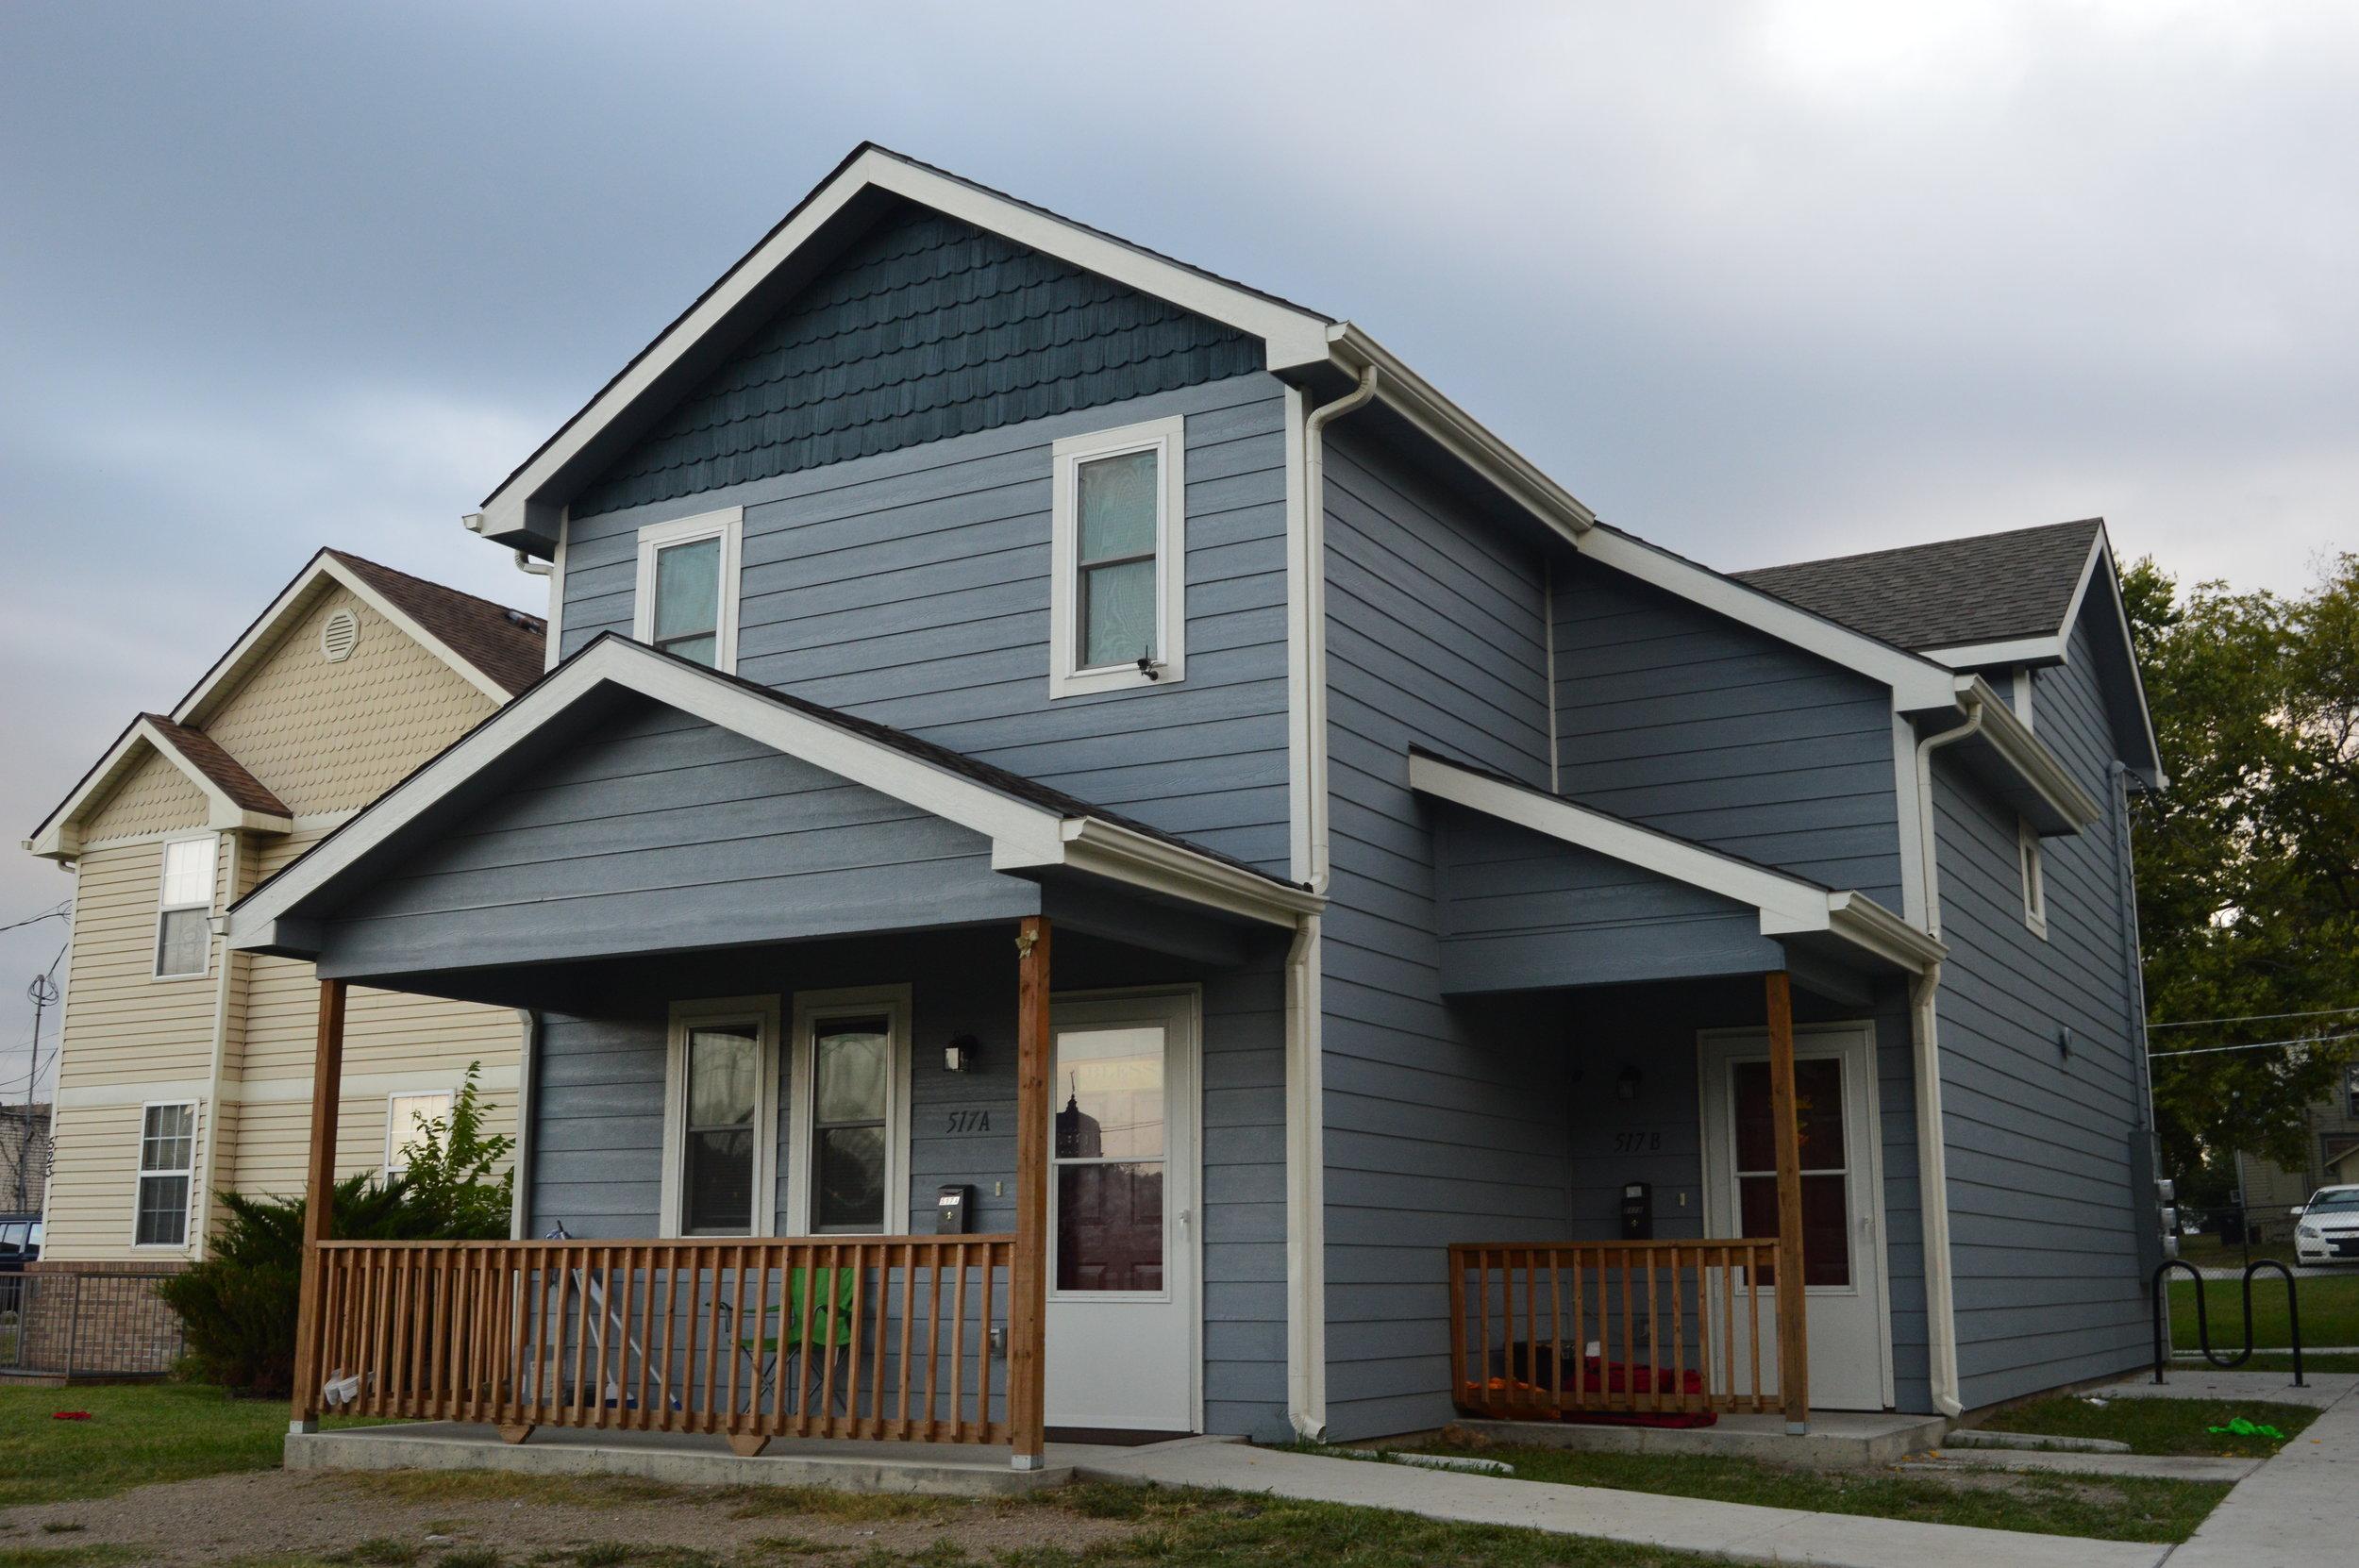 Cornerstone 517 Fillmore Duplex   Client: Cornerstone of Topeka Architect: Shirley Construction Co.